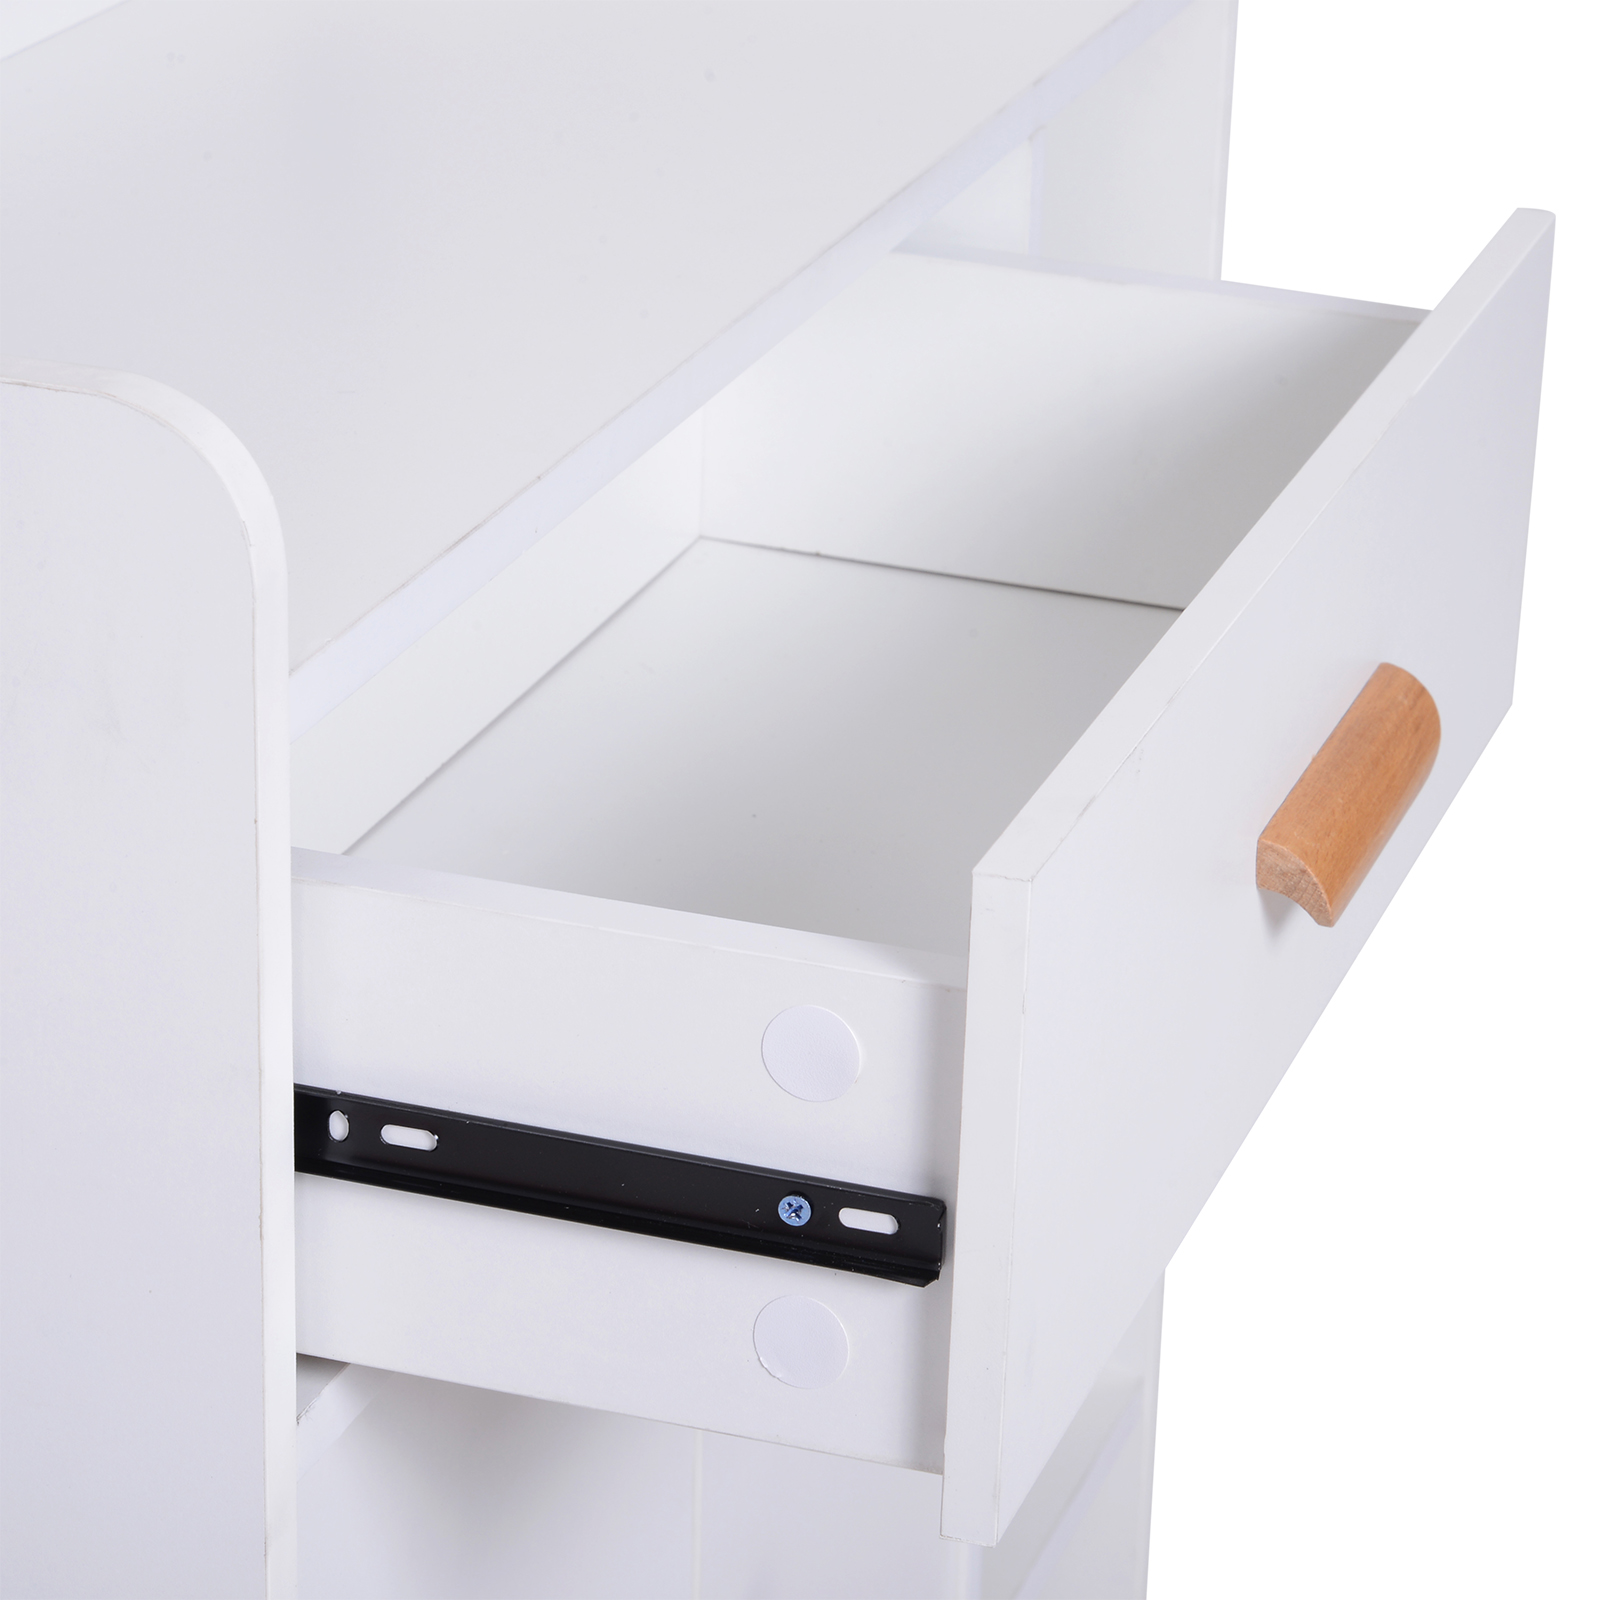 thumbnail 16 - Side-Cabinet-Hallway-Storage-Unit-Console-Table-Entrance-Shelf-Cupboard-2-color